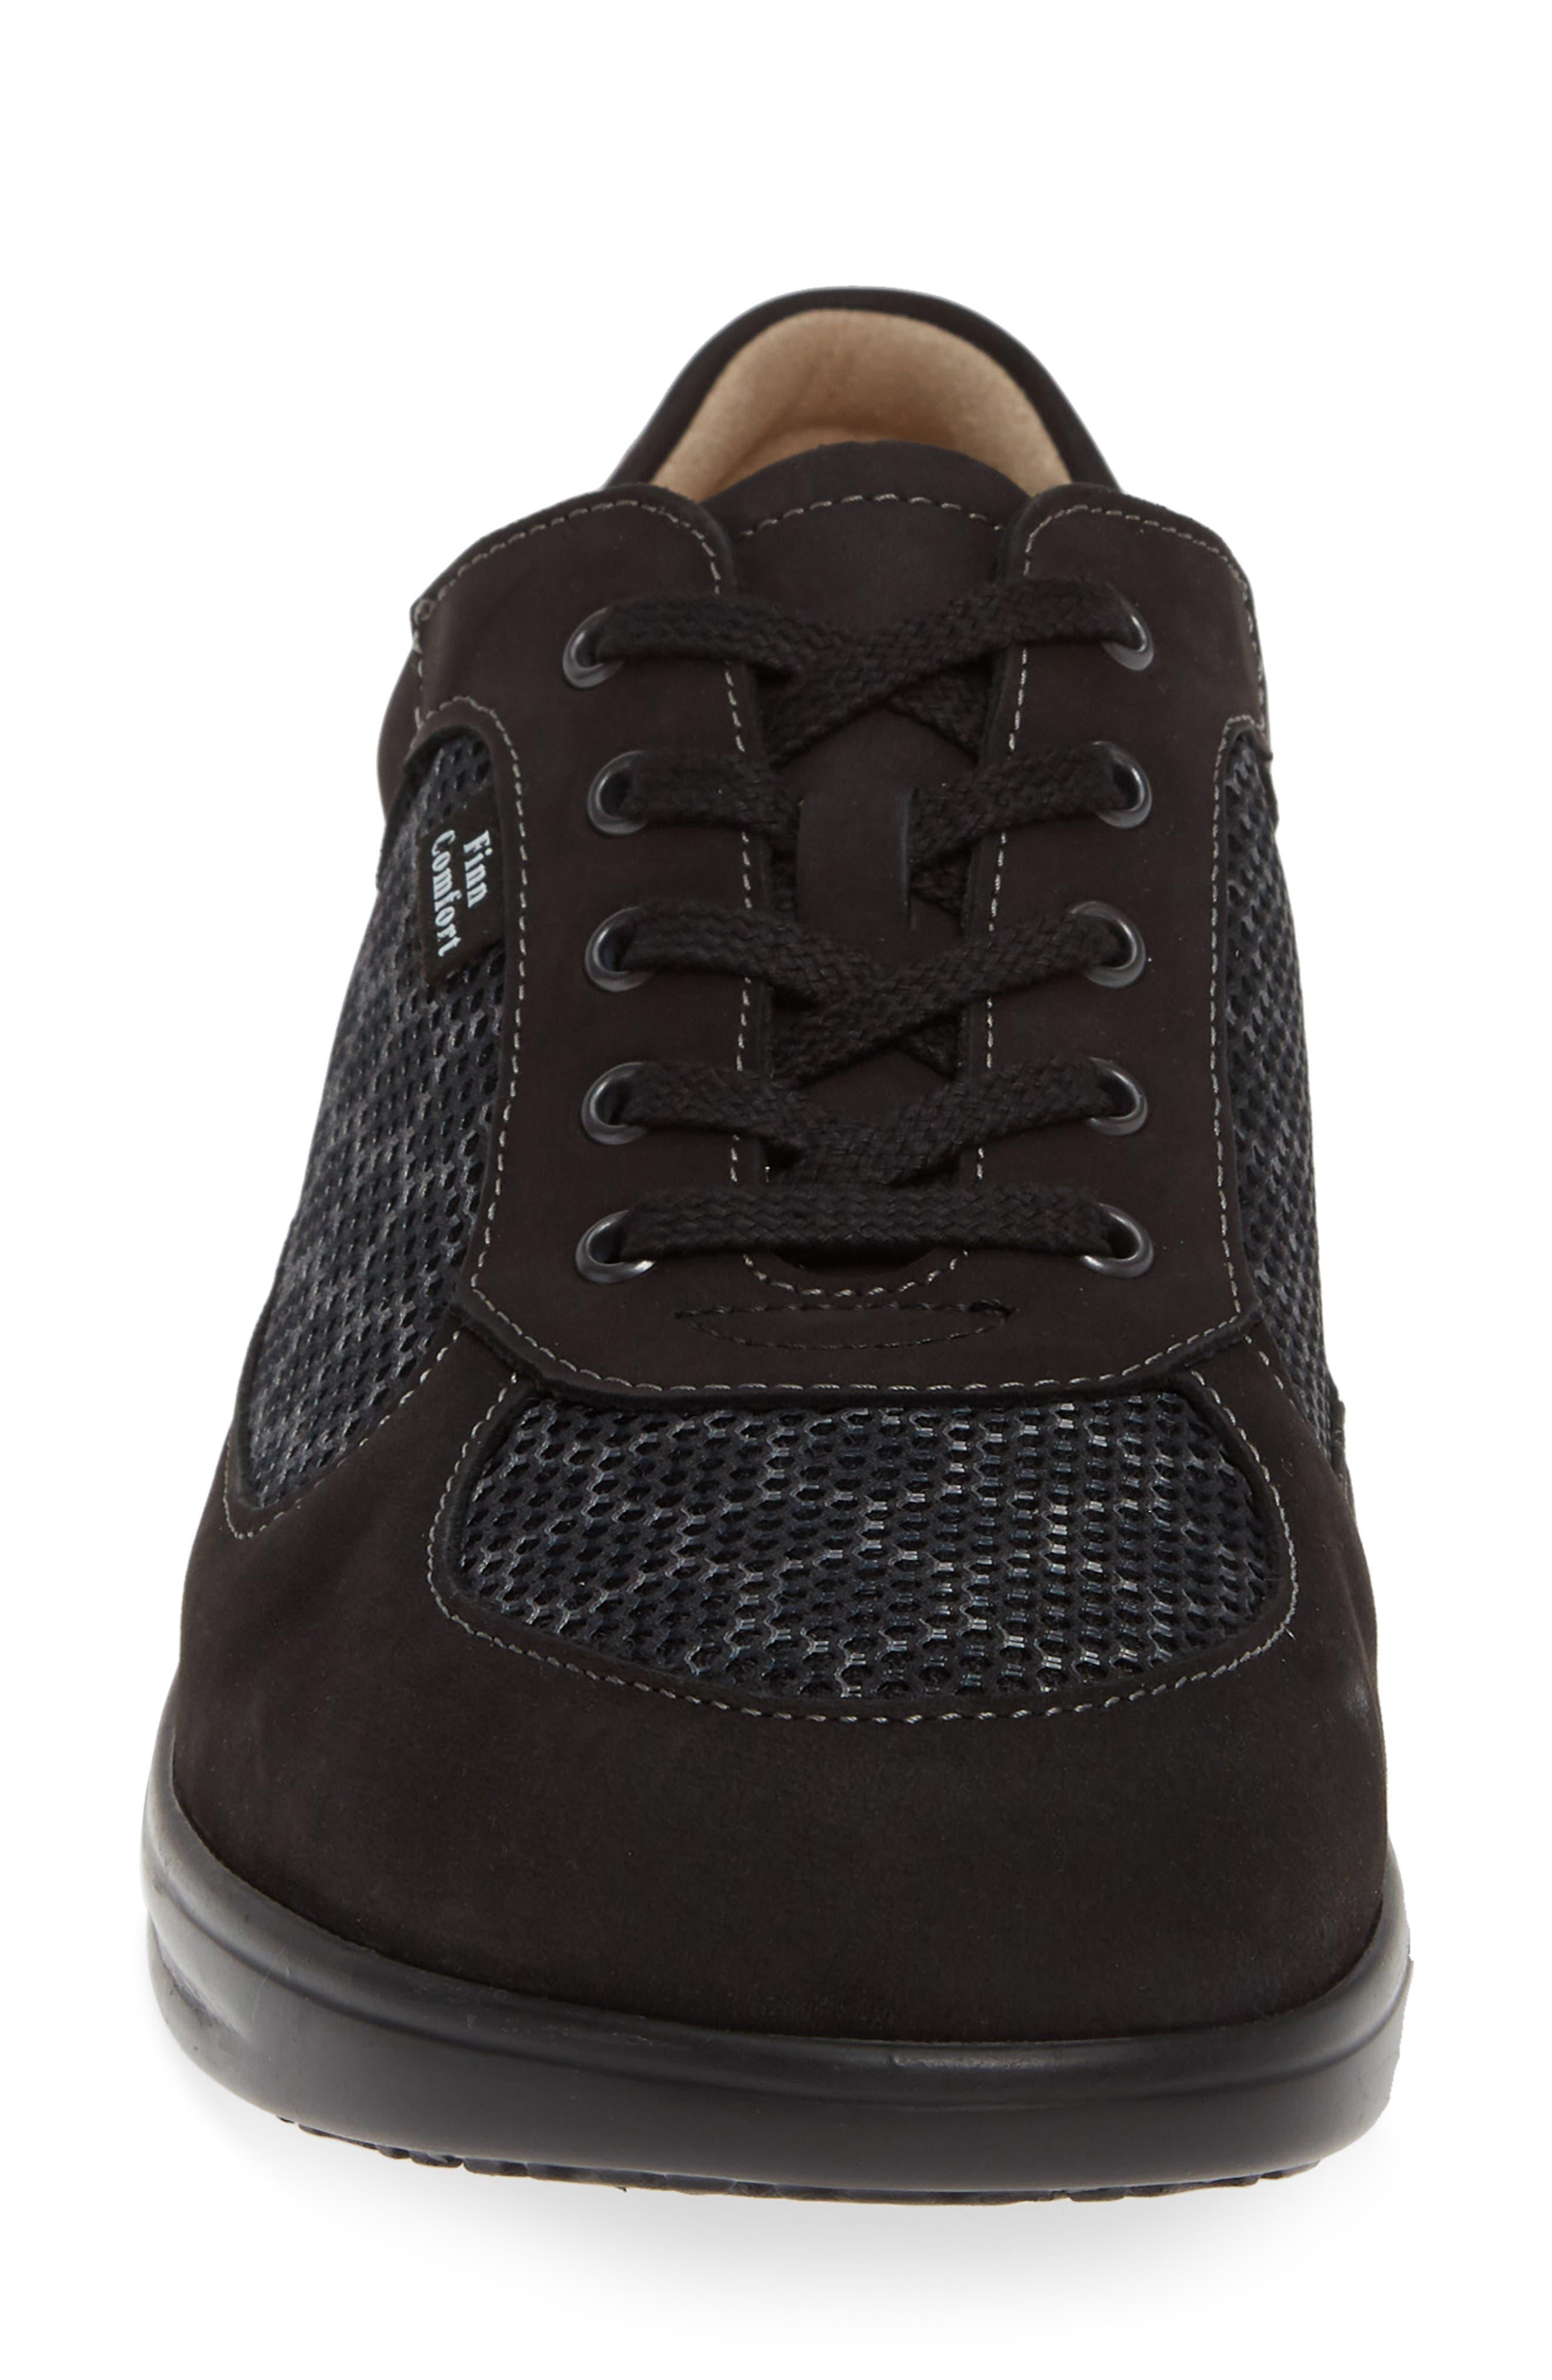 'Columbia' Sneaker,                             Alternate thumbnail 4, color,                             BLACK NUBUCK LEATHER